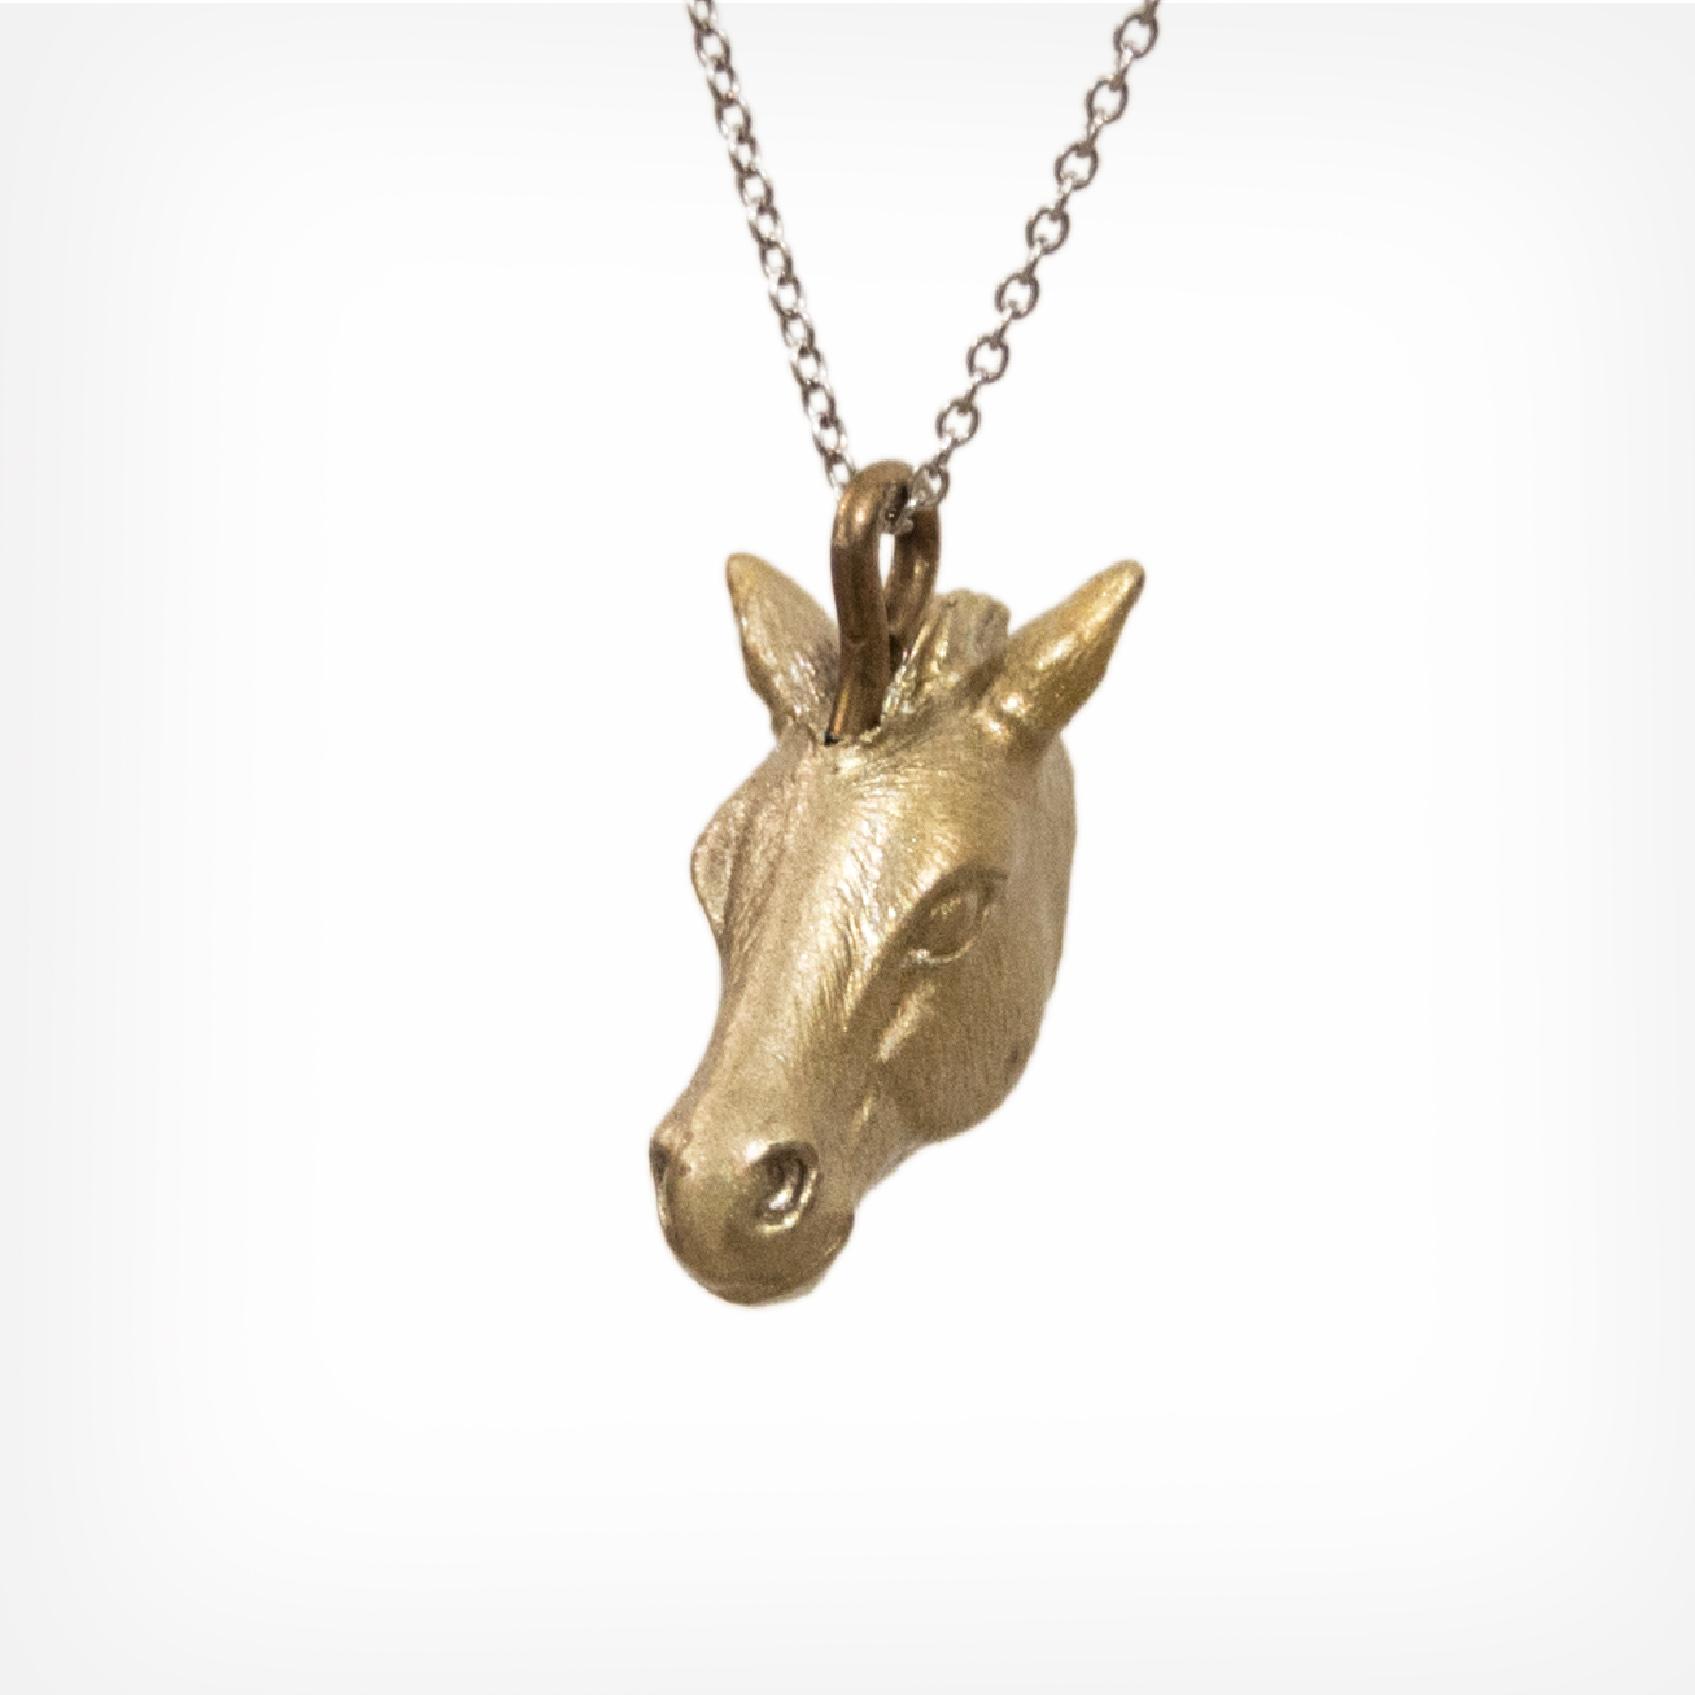 Pferd gold | horse gold